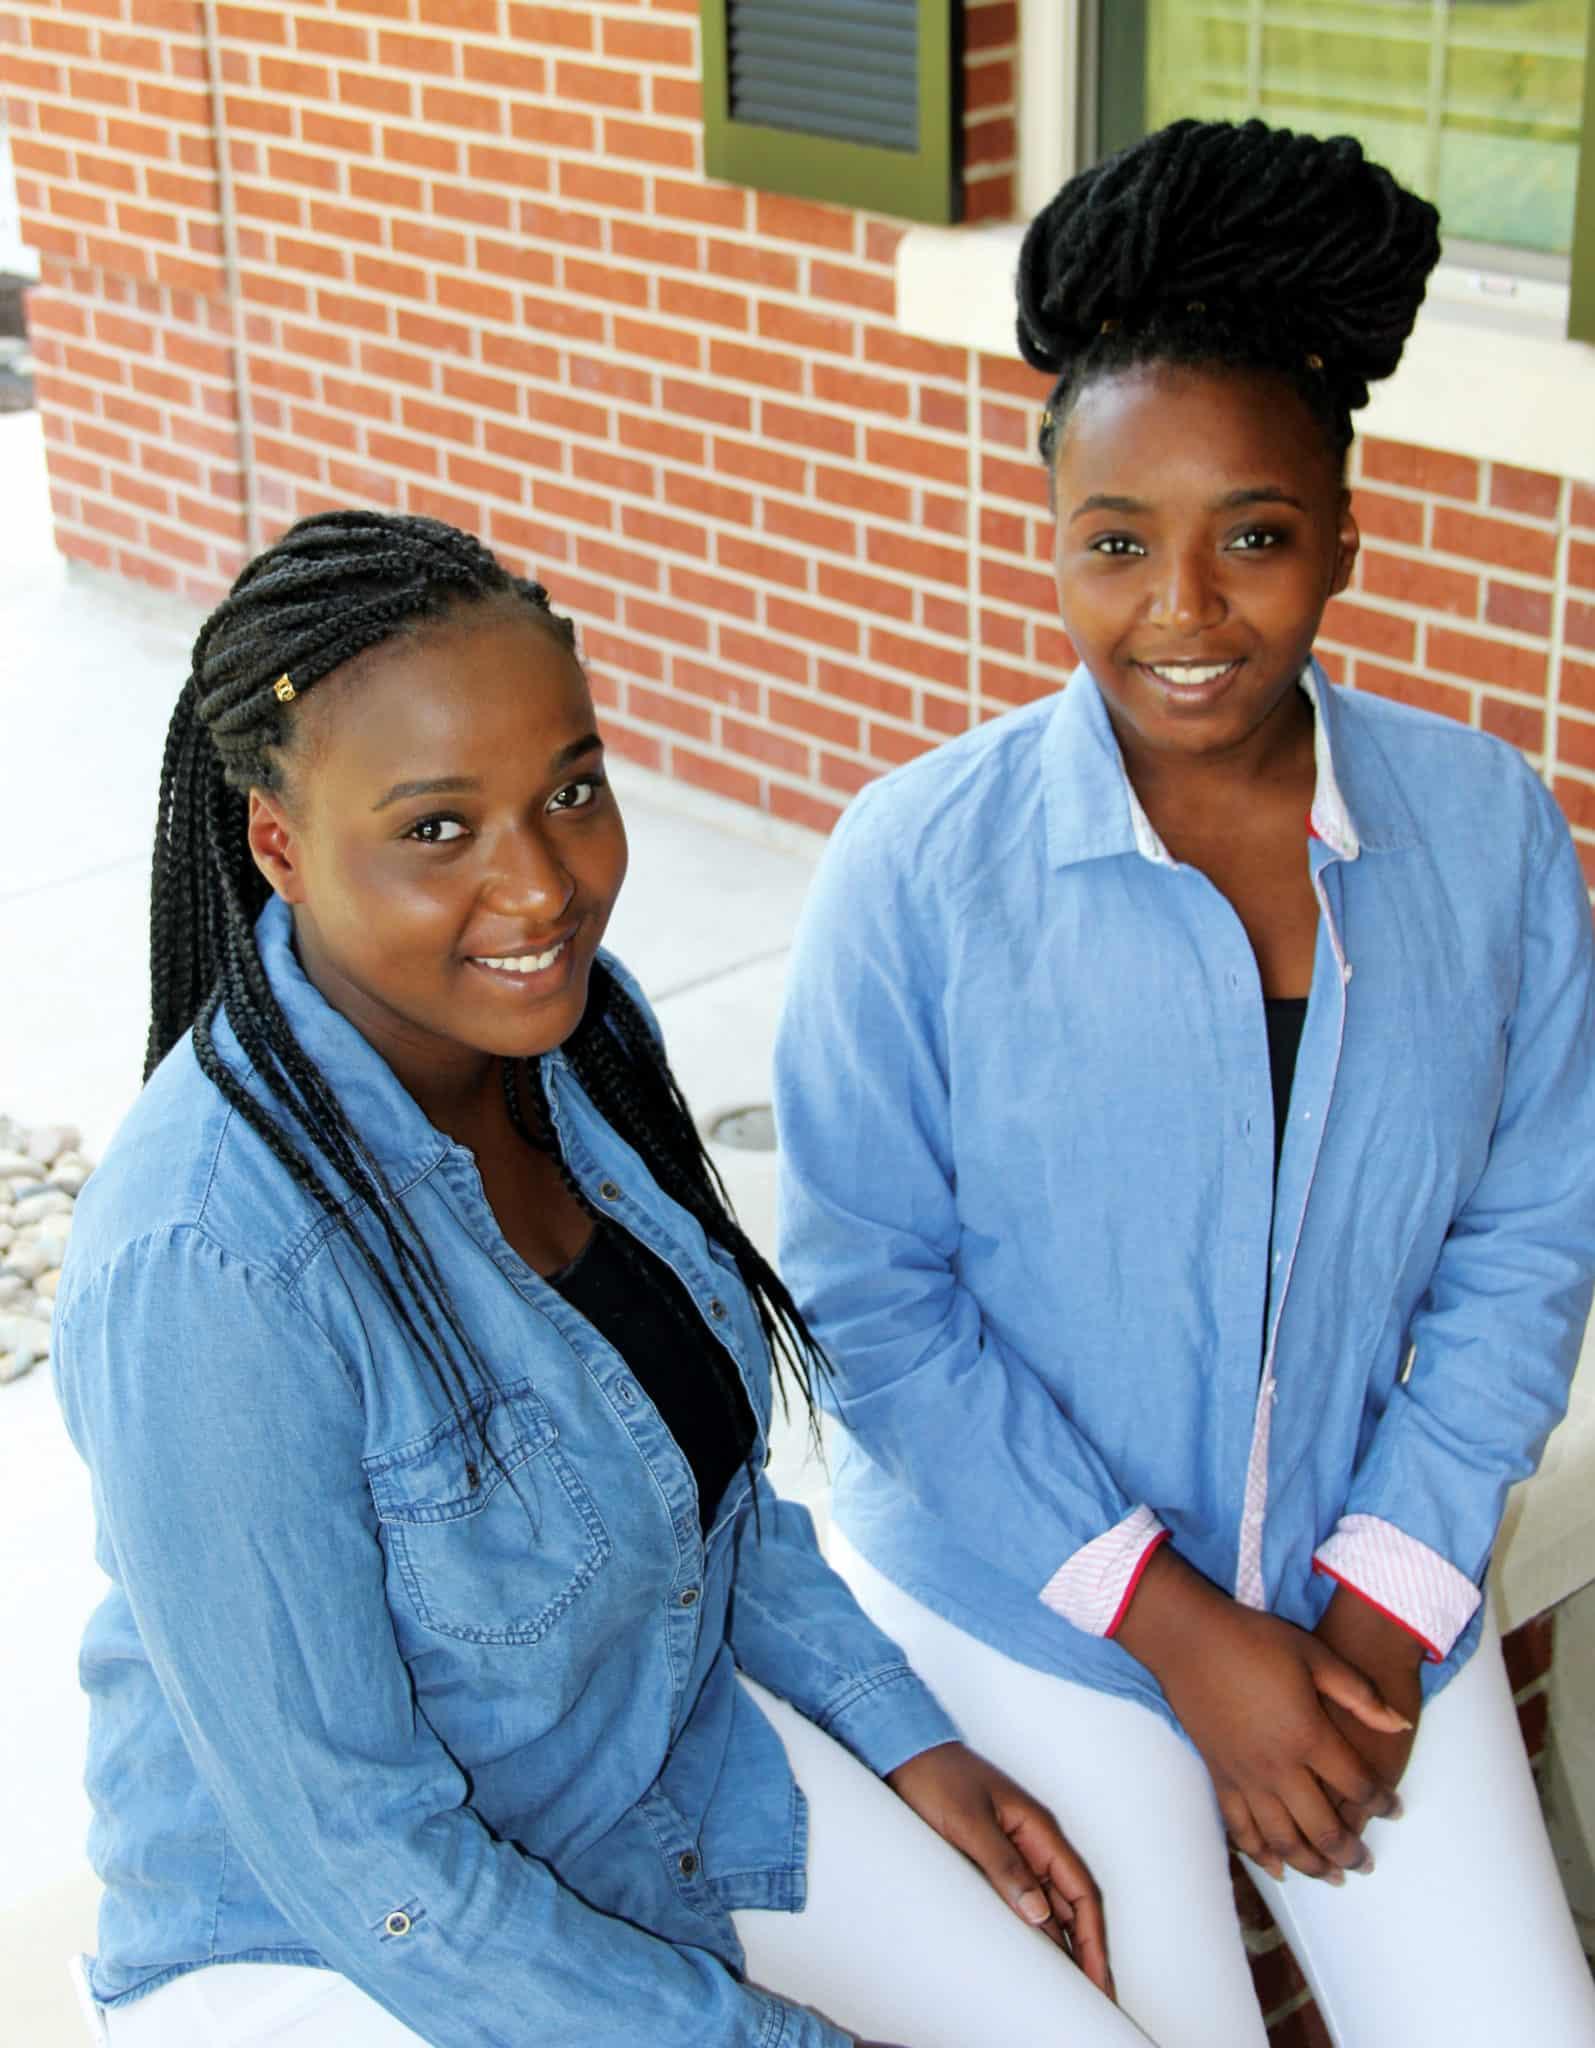 Youth profile - Christal and Christina